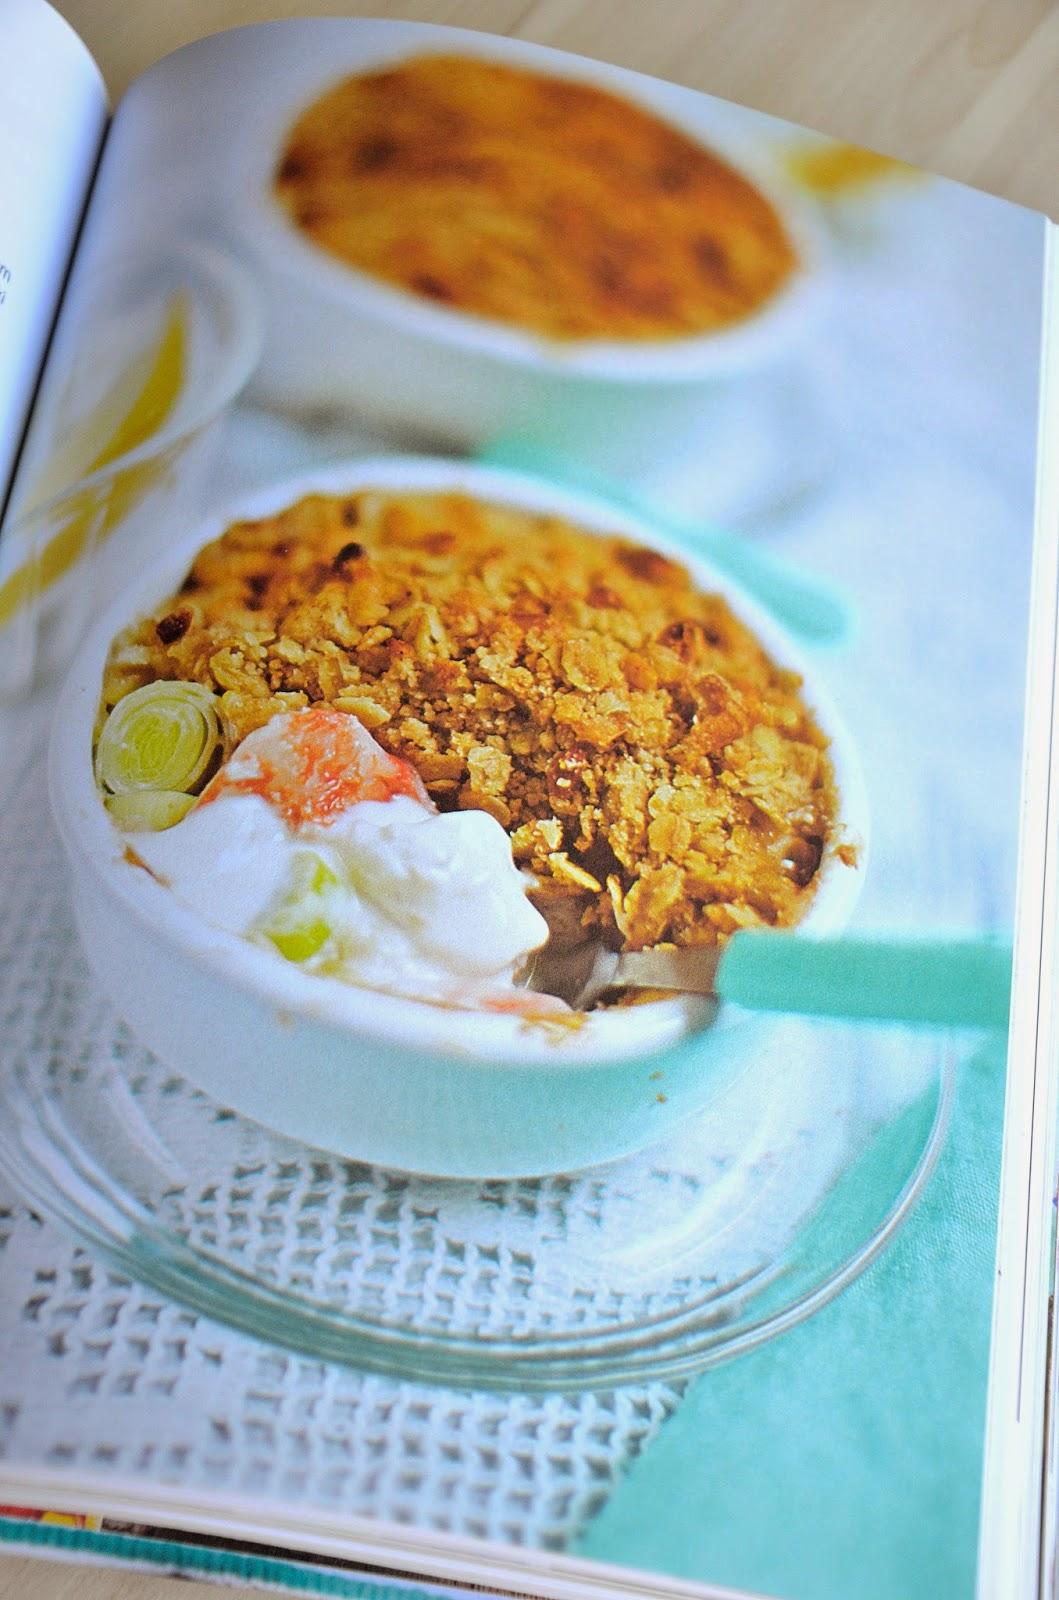 In Cooking We Trust Moja Mała Francuska Kuchnia Rachel Khoo